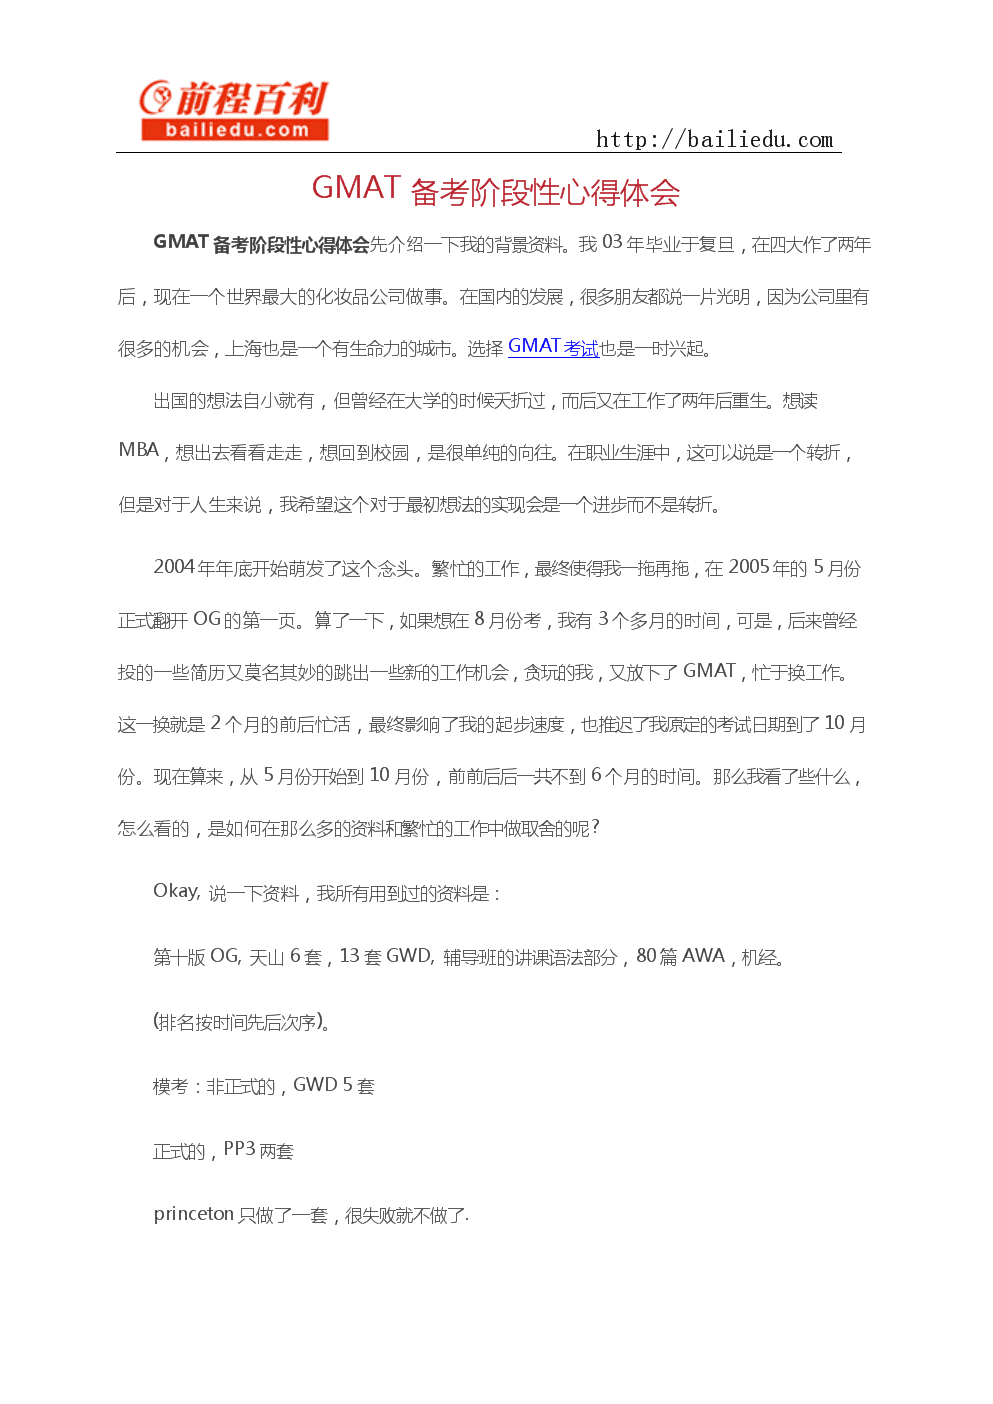 GMAT备考阶段性心得体会.docx